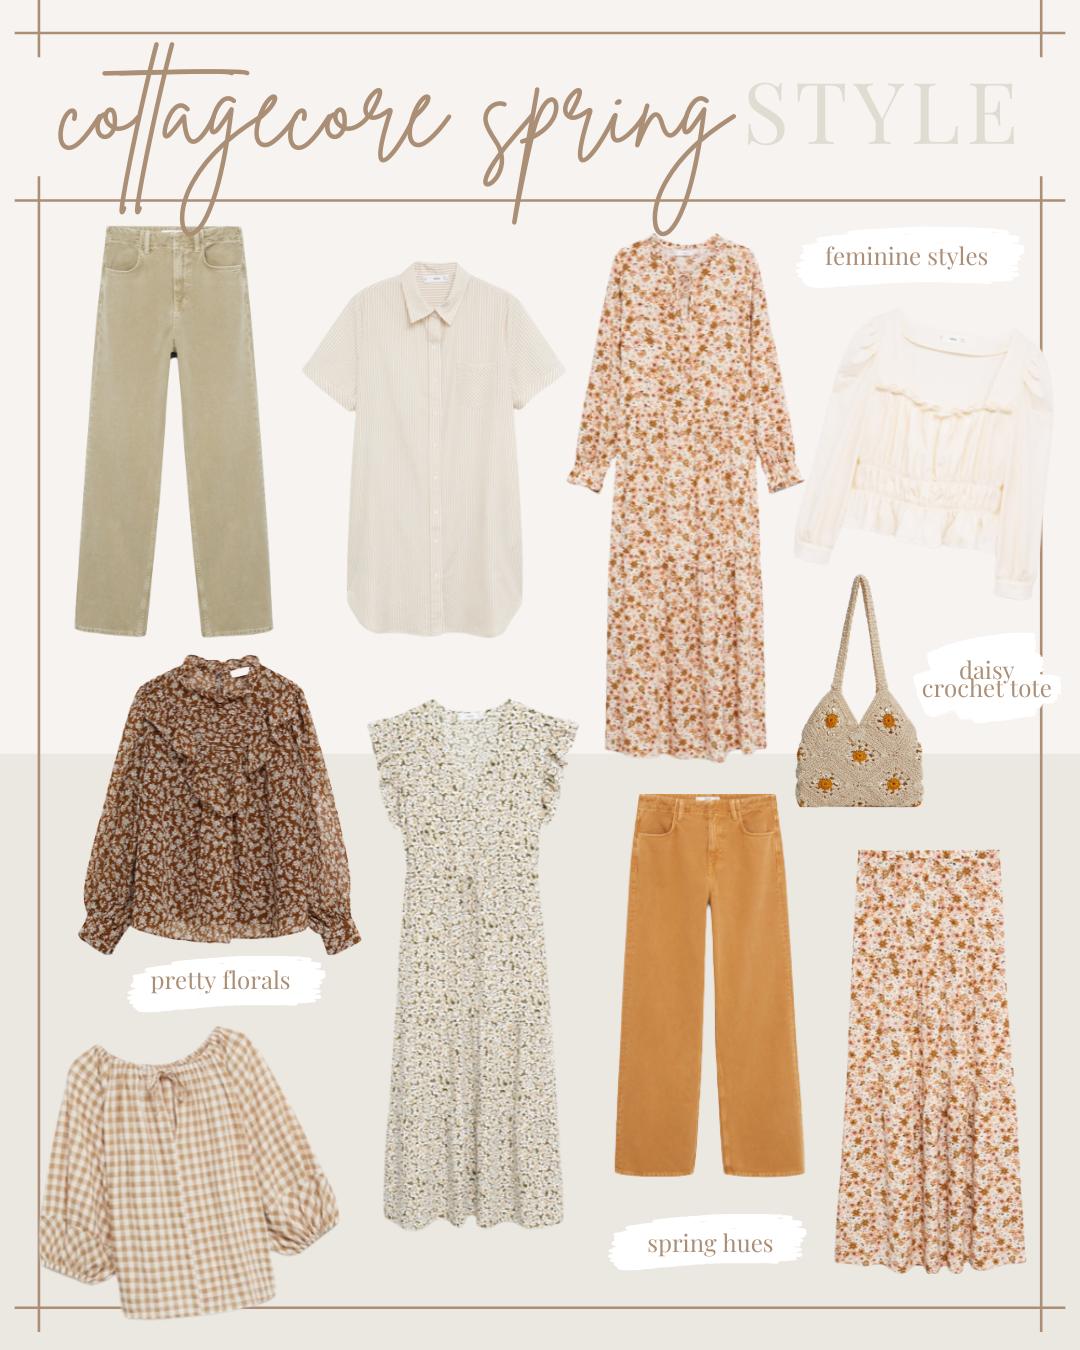 Cottagecore Spring Style | lifestyle | Louella Reese